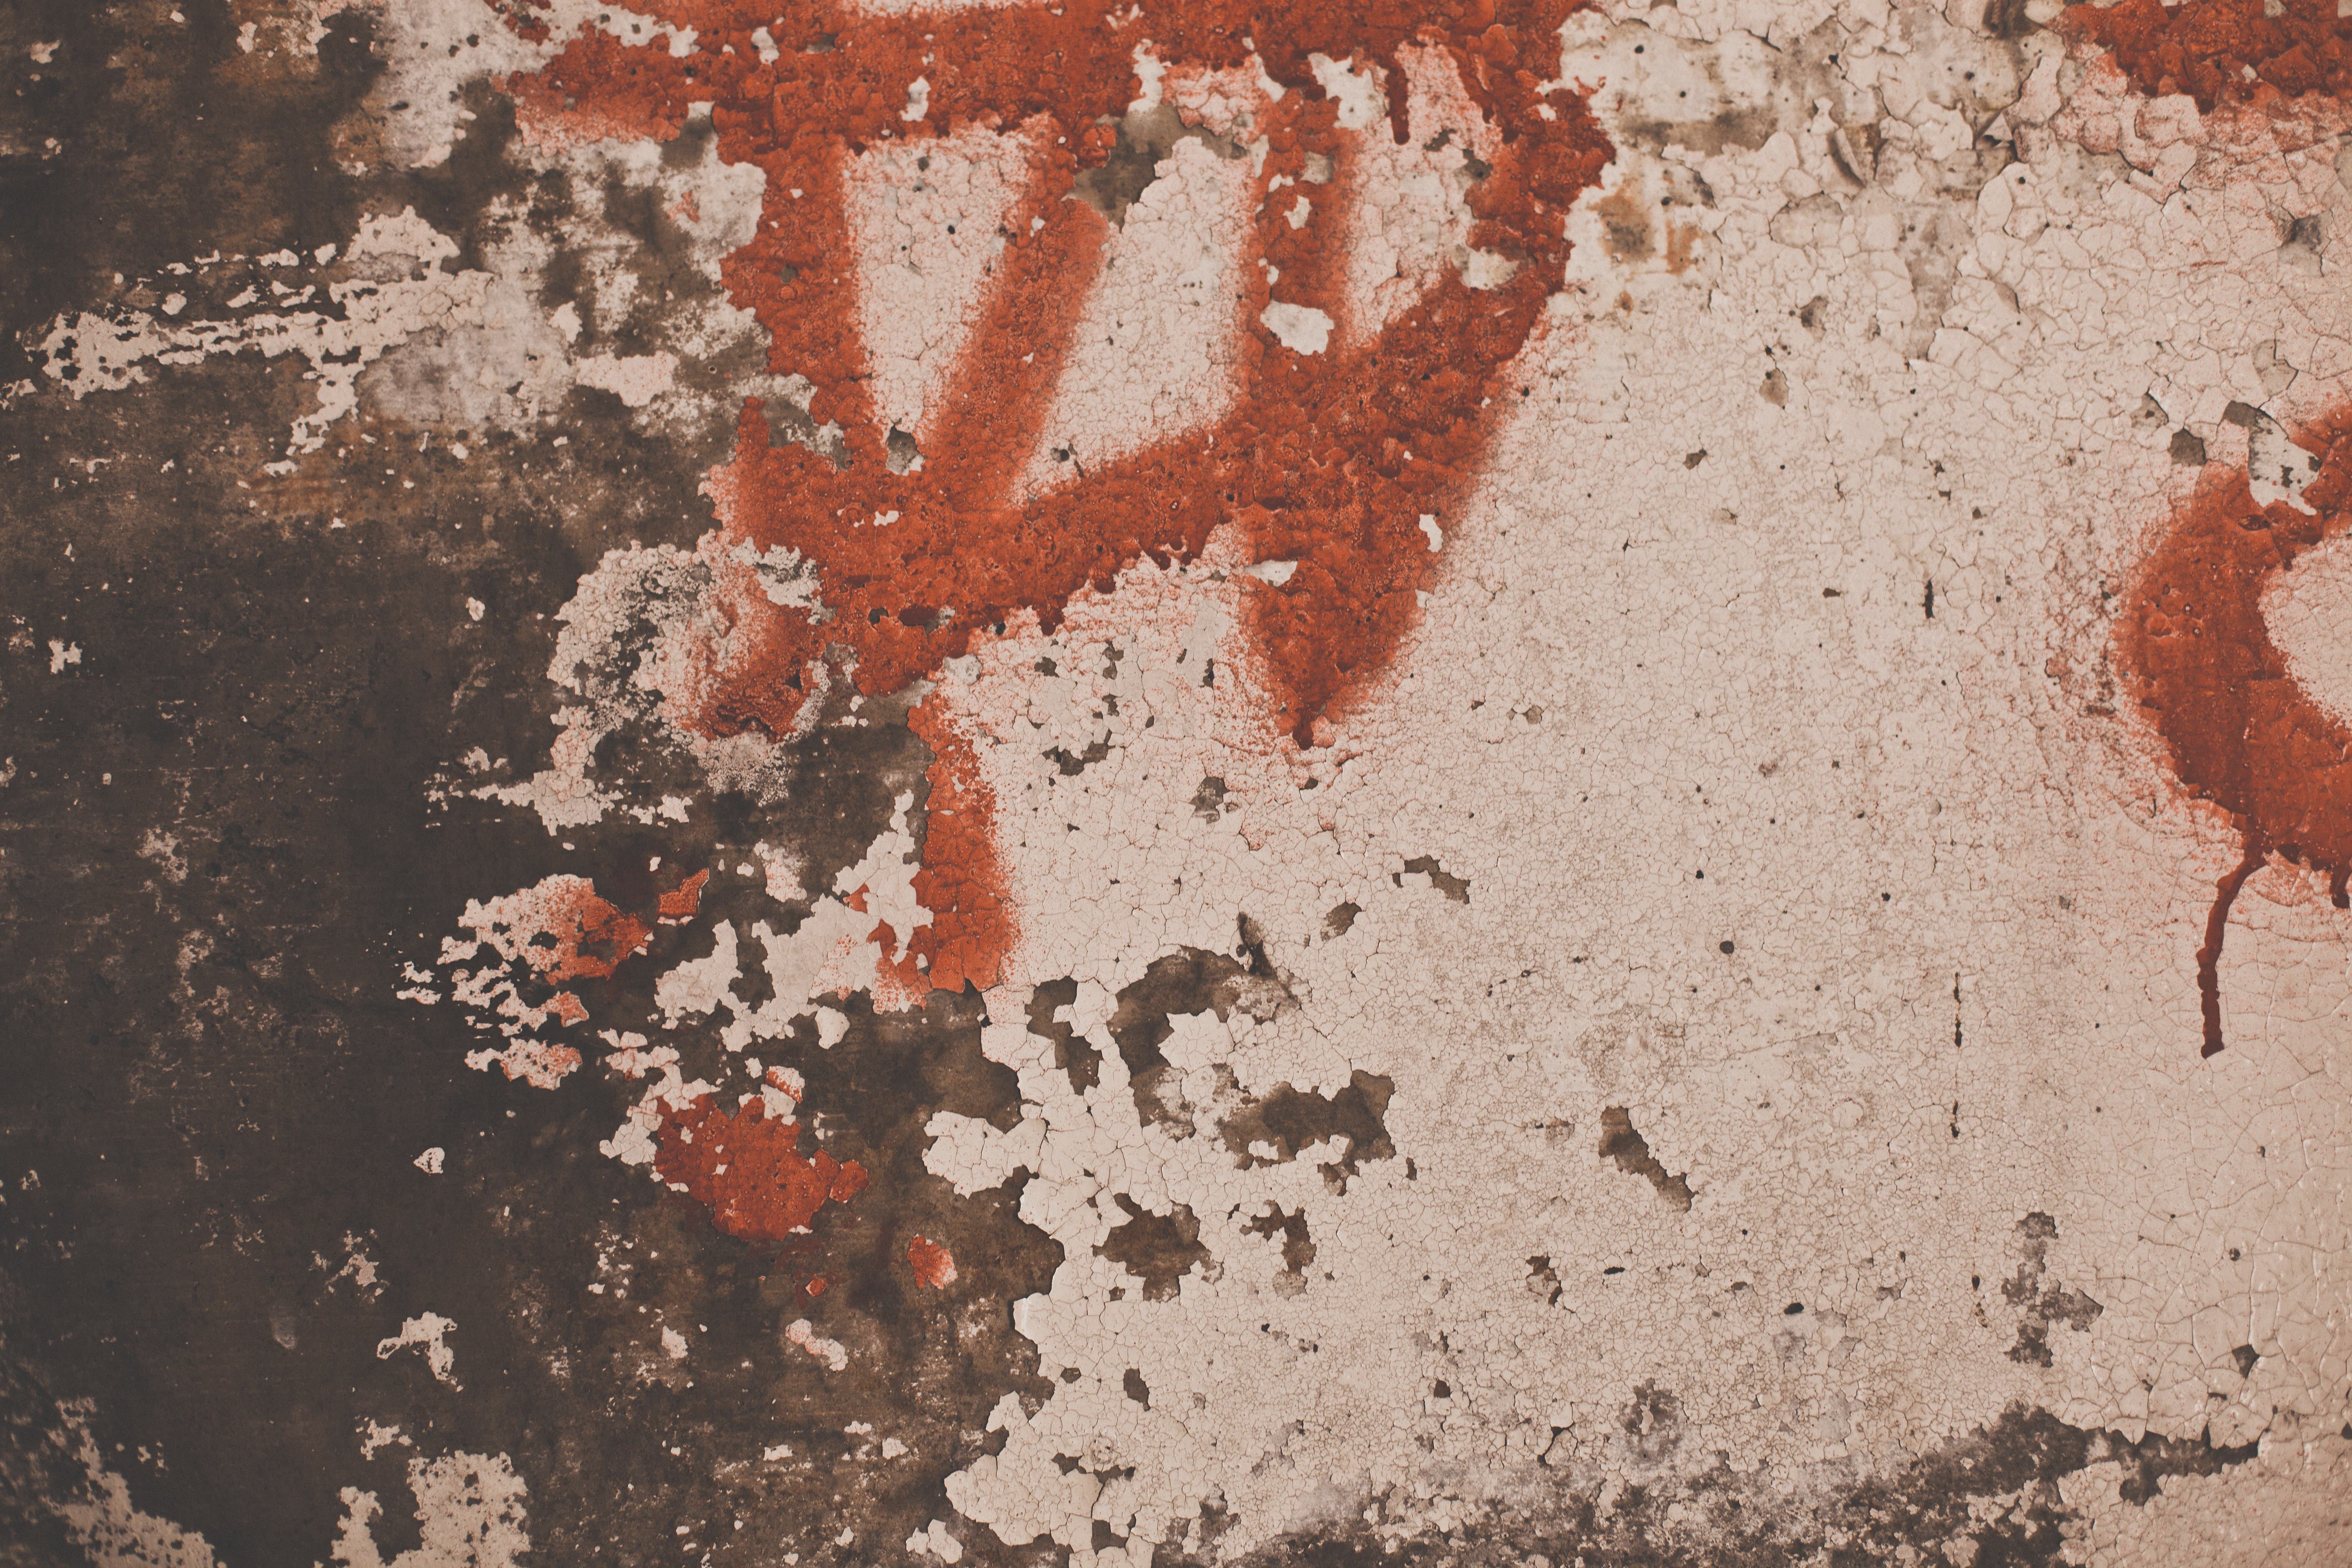 Peeled Paint on Grunge Wall Texture, Damaged, Grunge, Grungy, Overlay, HQ Photo